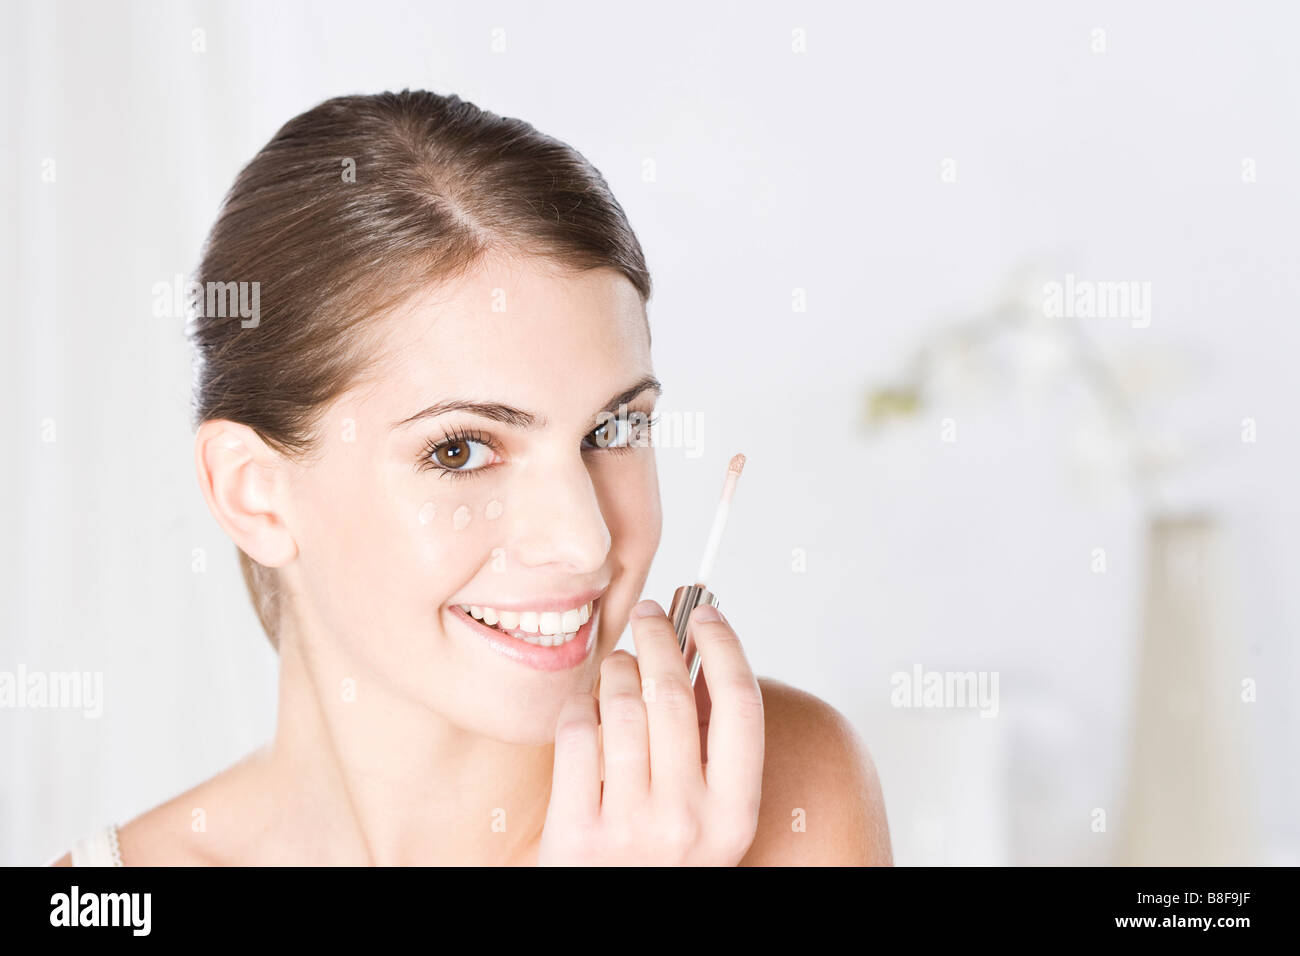 woman holding make-up pad - Stock Image